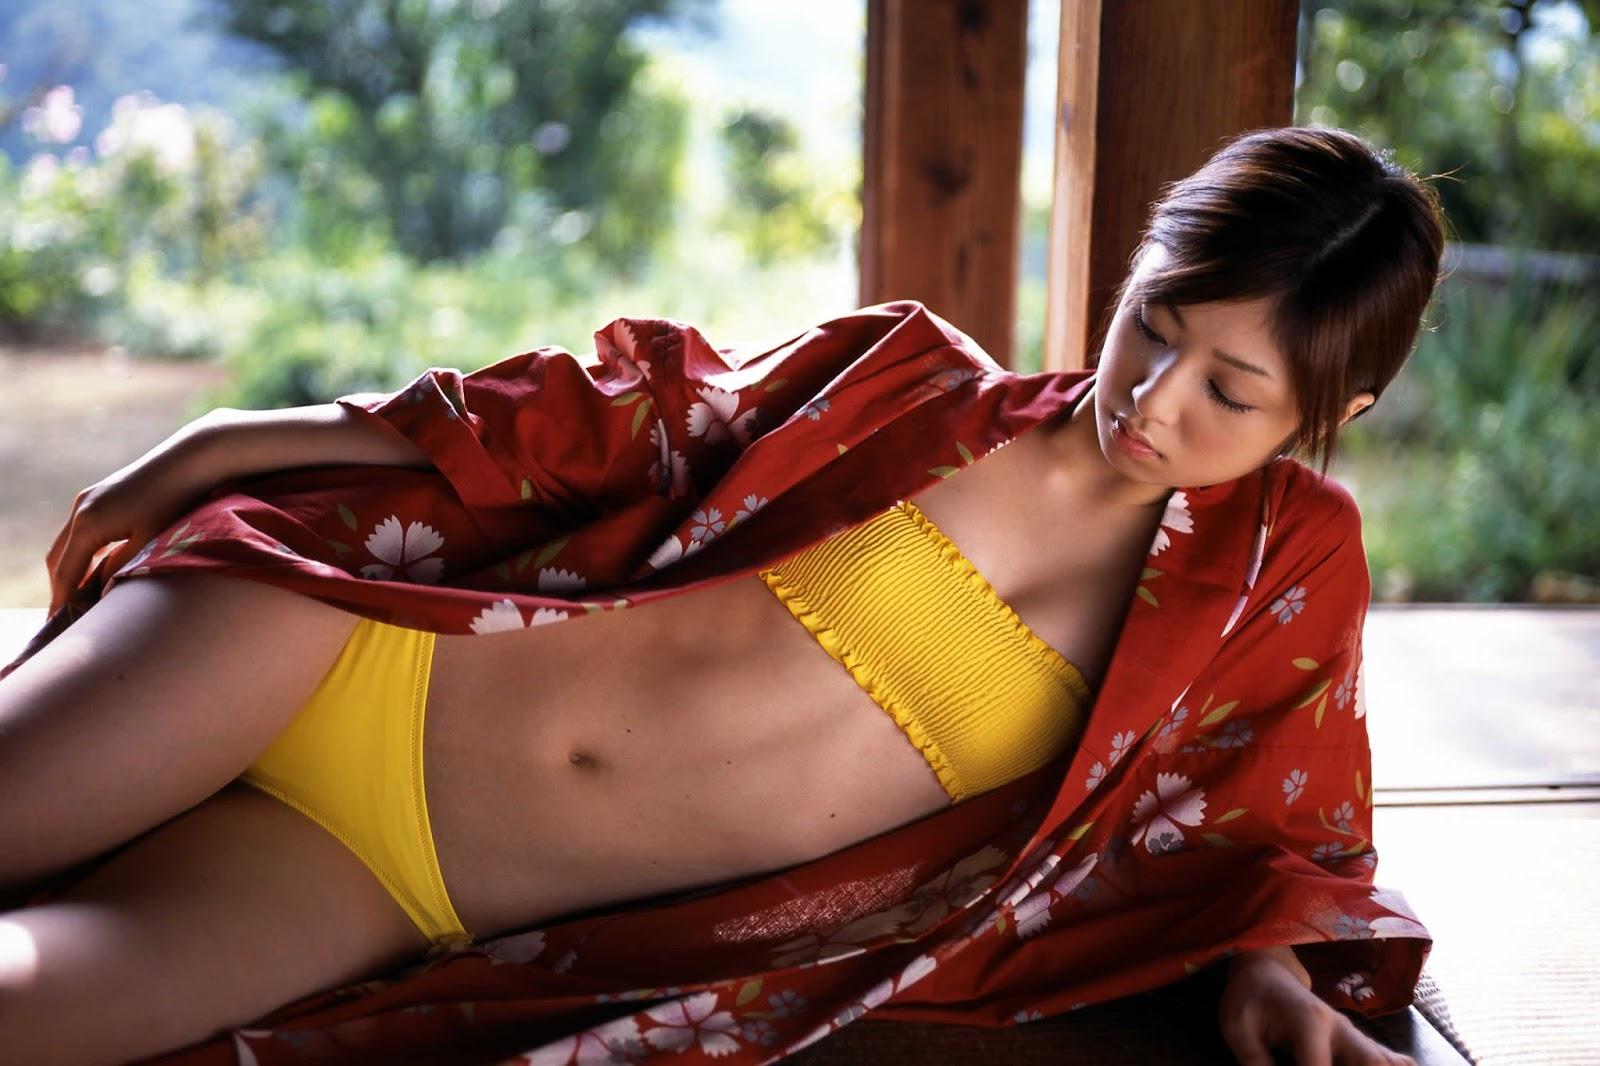 Japan kimono hot girls photo, naked jennifer nyce